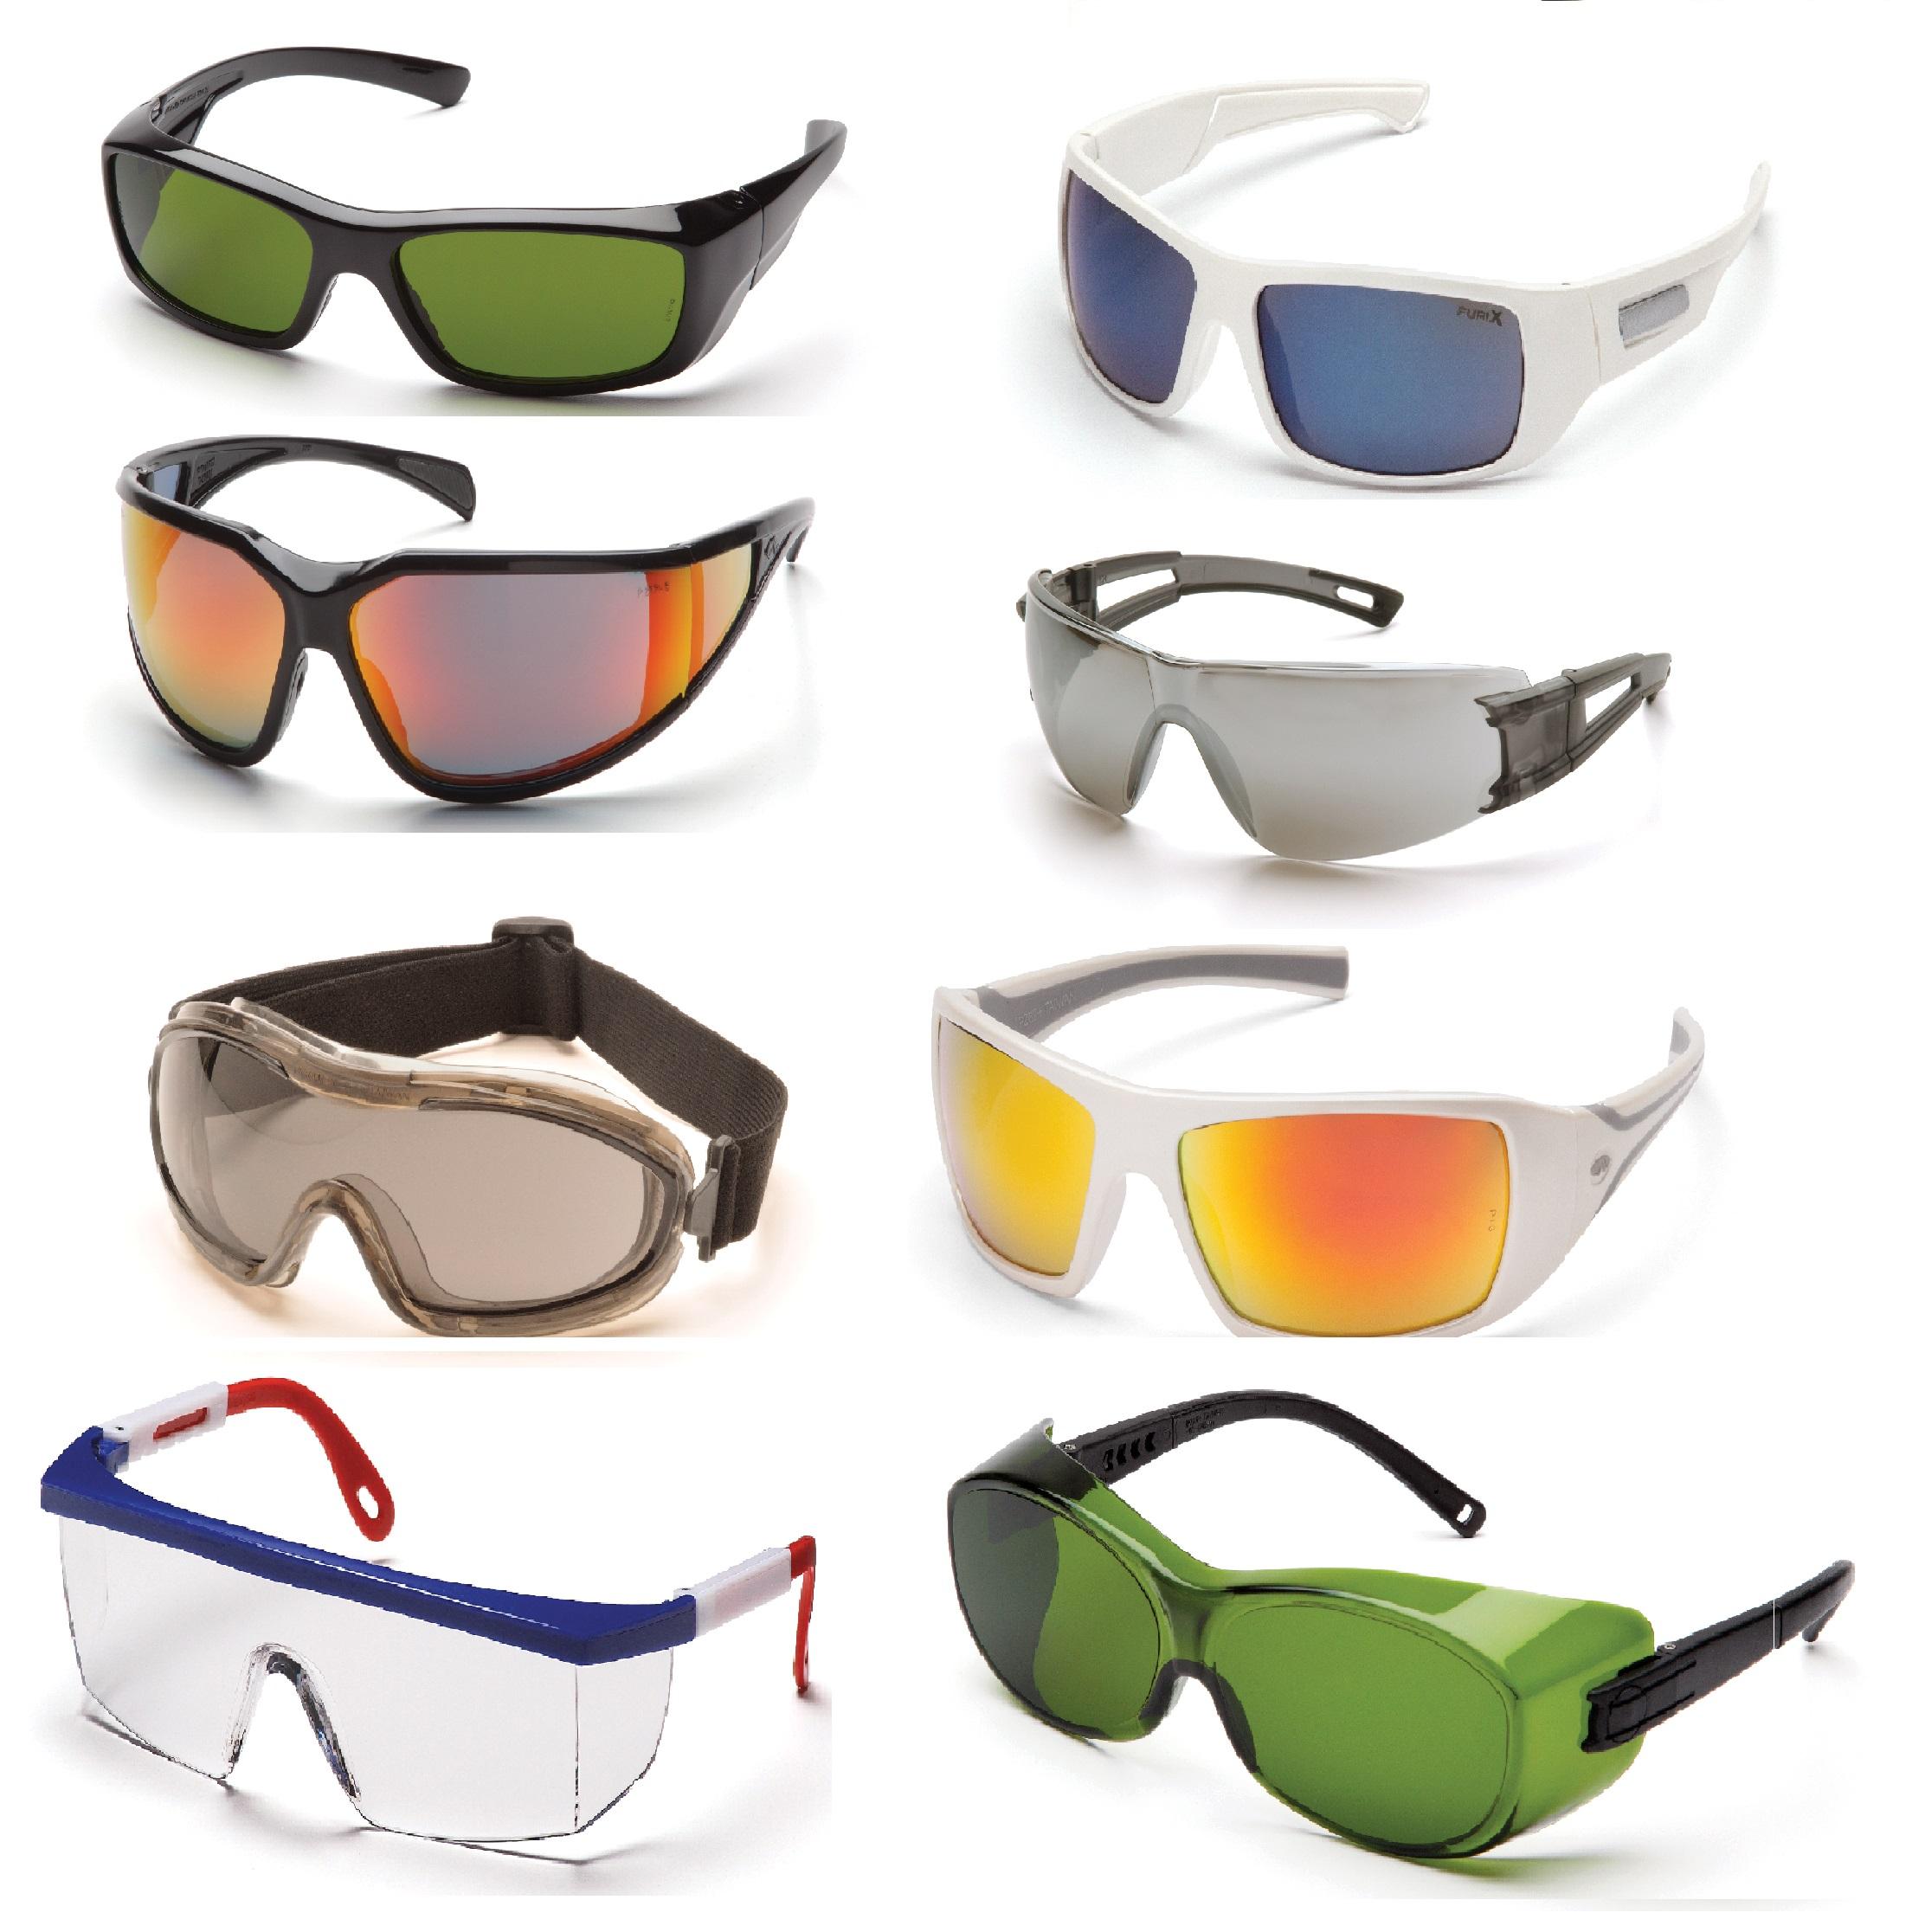 home-page-safety-eyewear-2.jpg